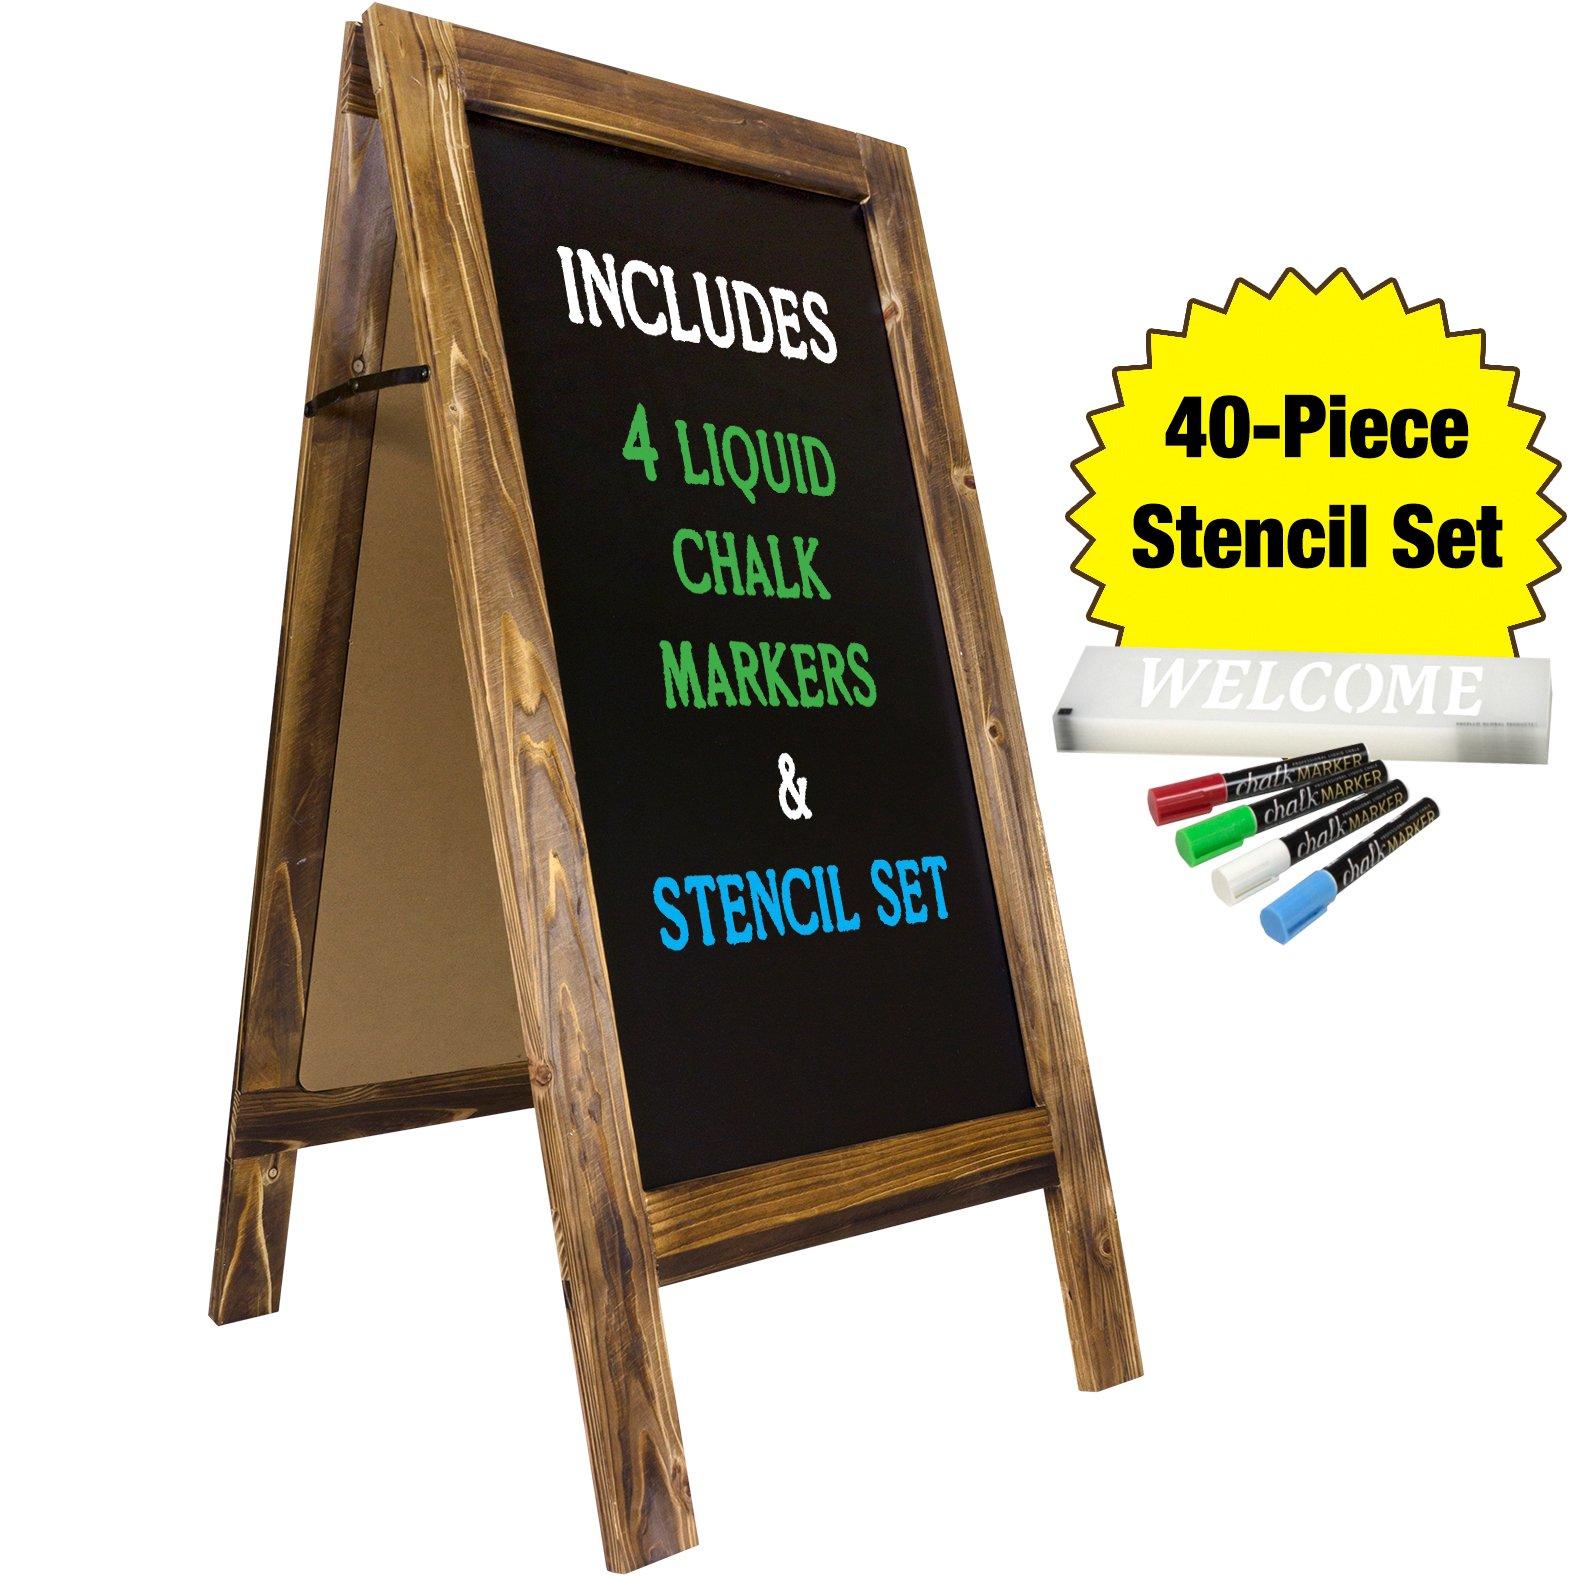 Large Sturdy Handcrafted 40'' x 20'' Wooden A-Frame Chalkboard Display / 4 LIQUID CHALK MARKERS & STENCIL SET / Sidewalk Chalkboard Sign Sandwich Board / Chalk Board Standing Sign (Rustic)